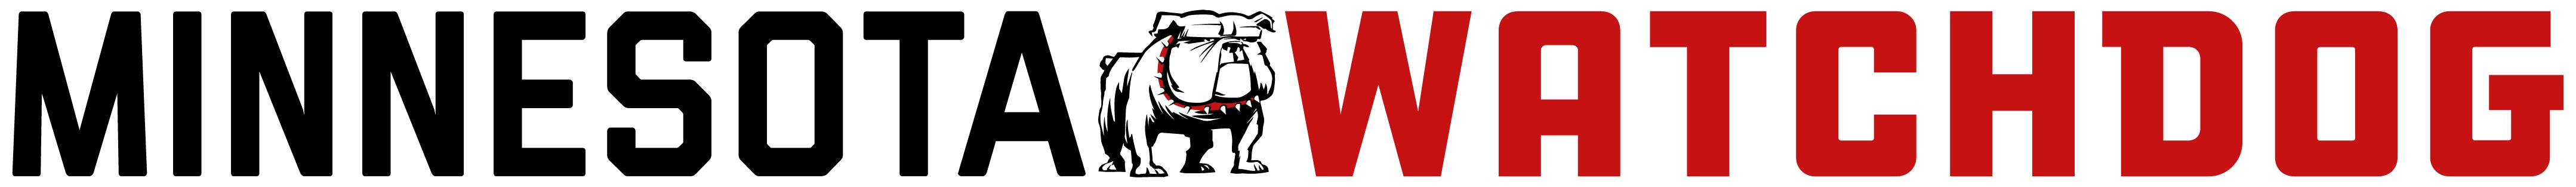 Minnesota Watchdog